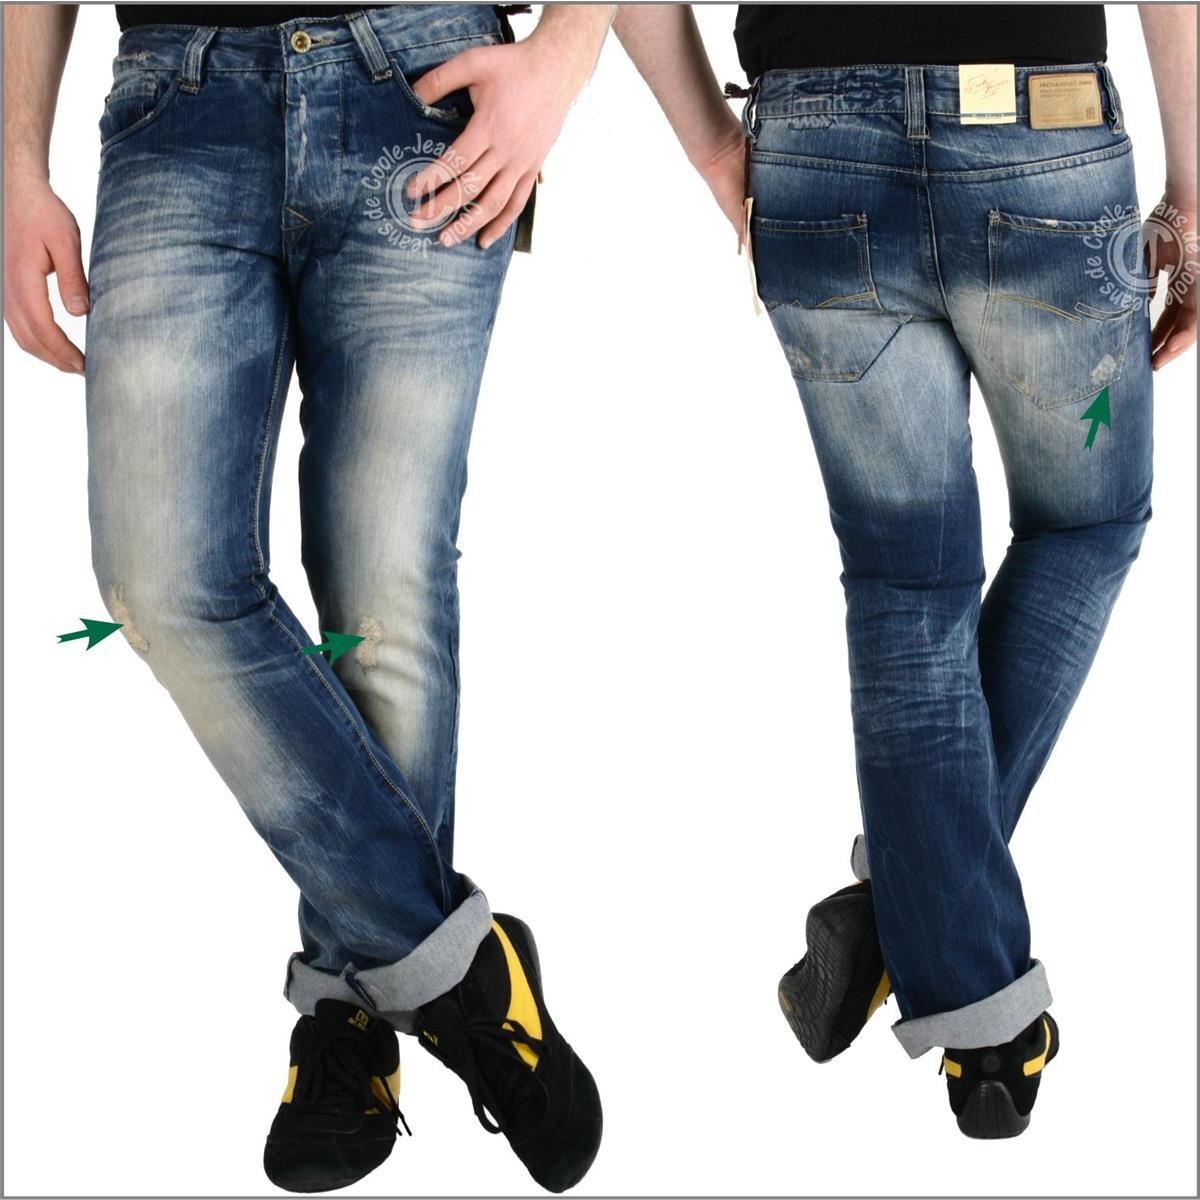 waschmaschine jeans inspirierendes design f r wohnm bel. Black Bedroom Furniture Sets. Home Design Ideas